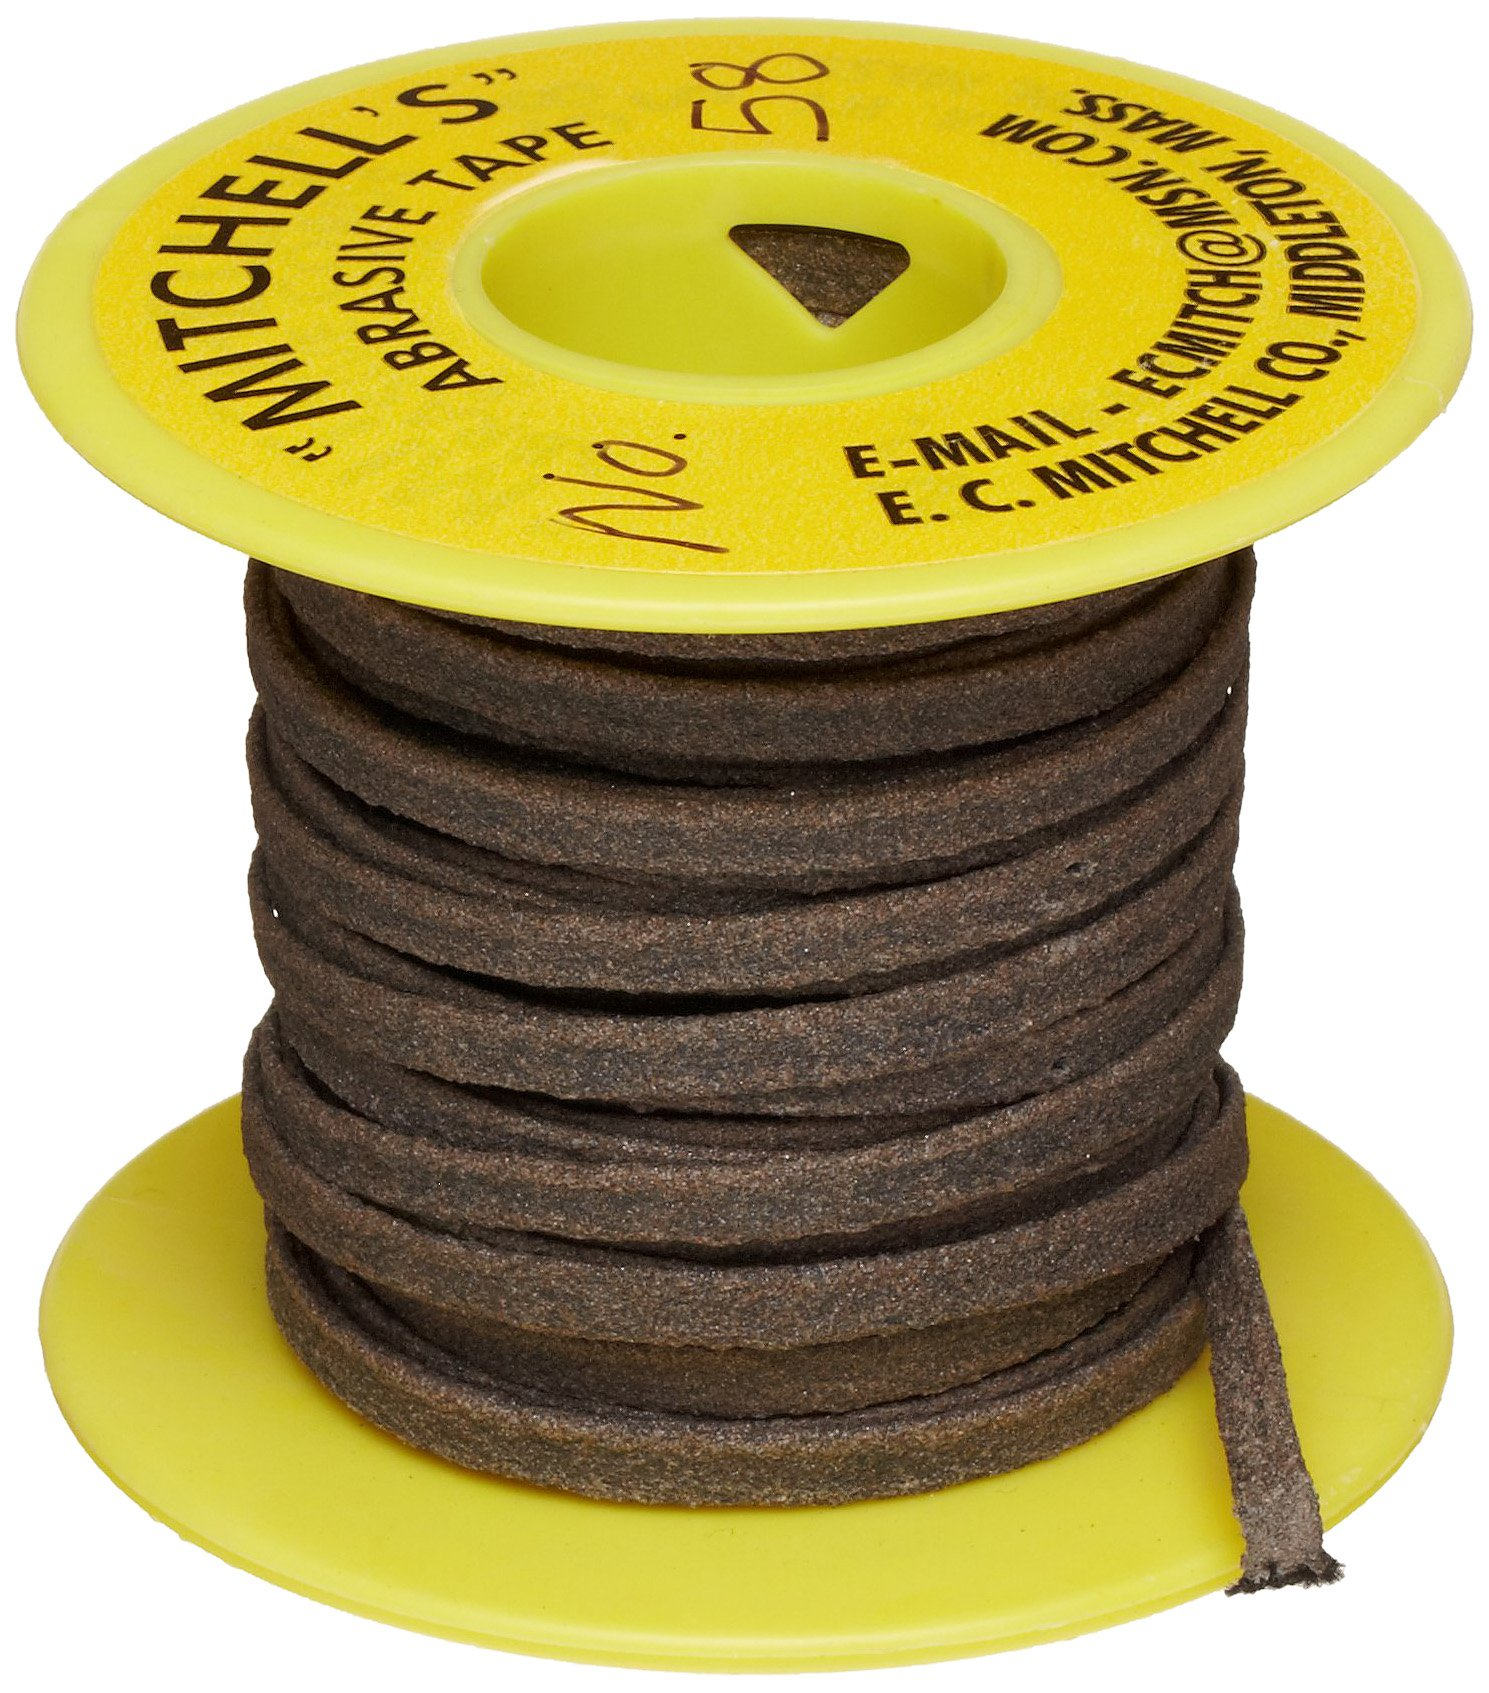 Mitchell Abrasives 58 Flat Abrasive Tape, Aluminum Oxide 150 Grit 3/16'' Wide x 25 Feet